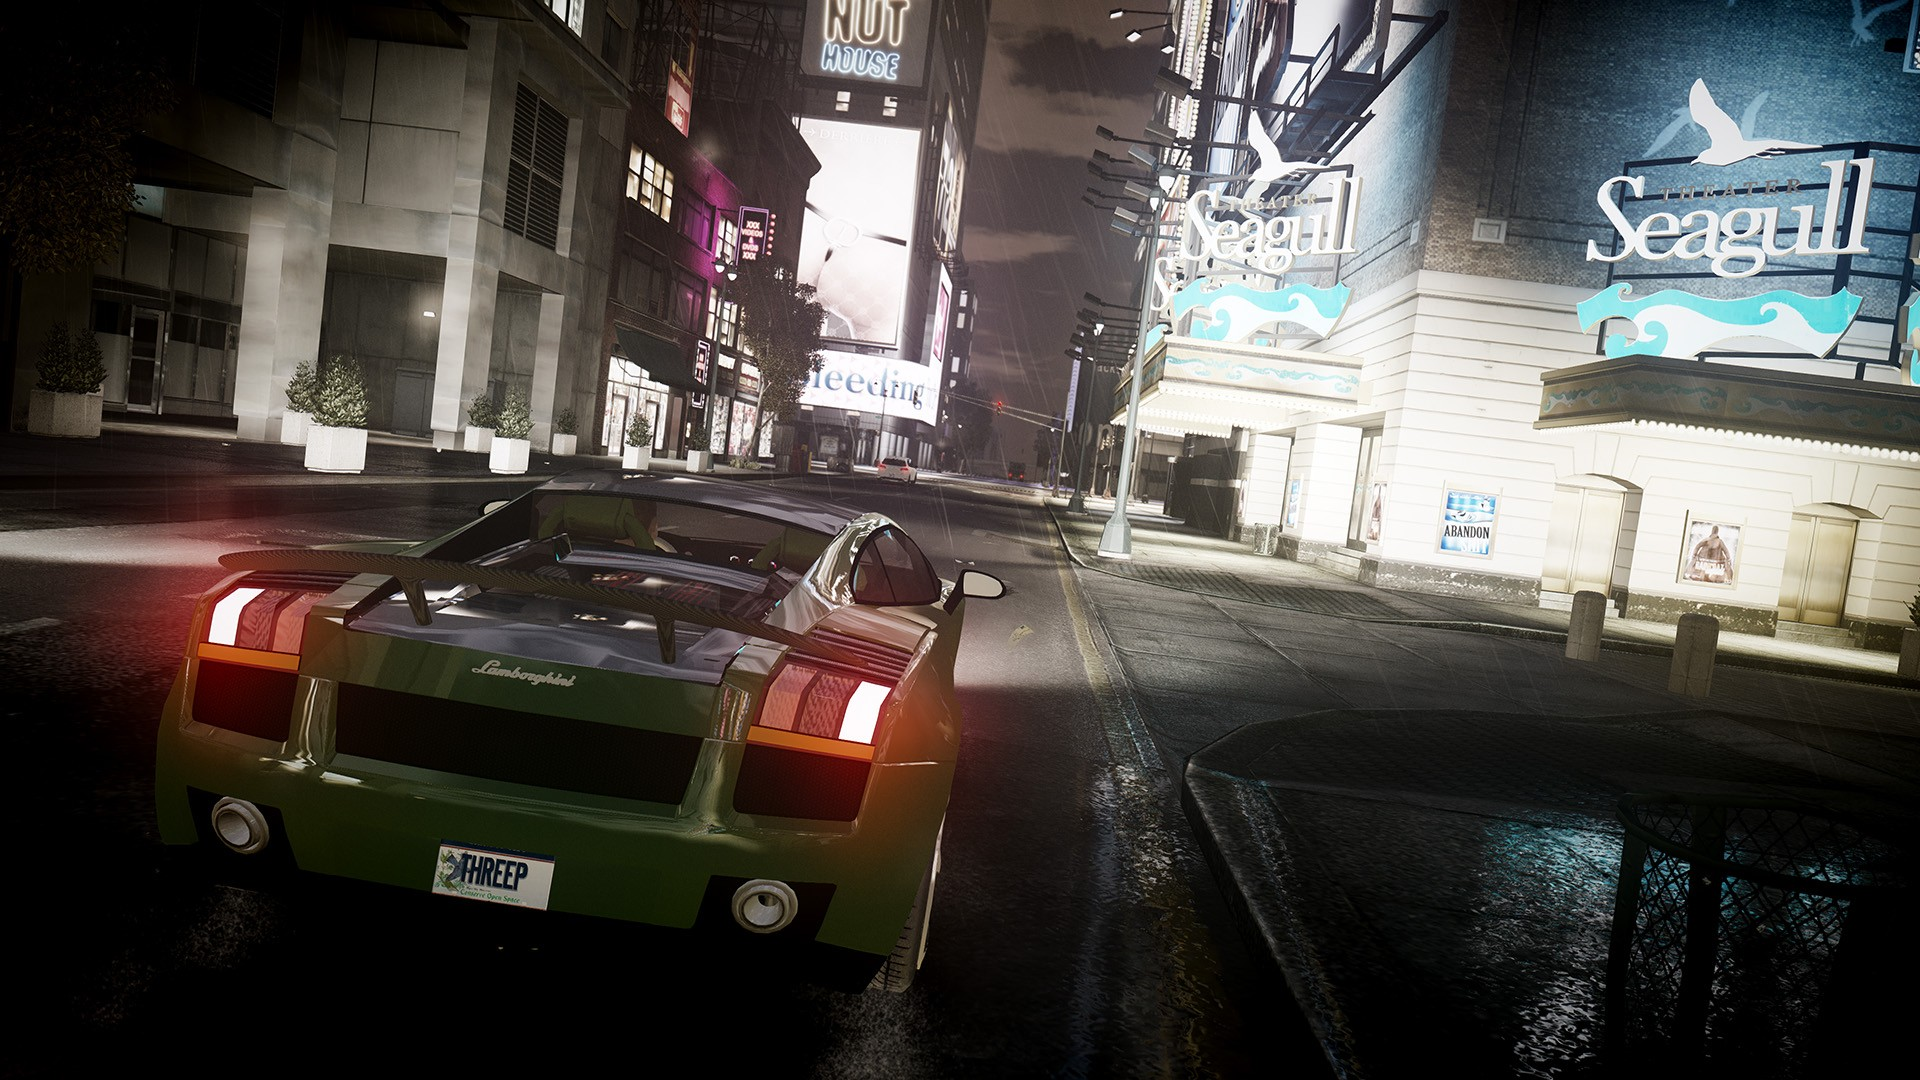 Fantastický pohled na GTA IV v 4K 88035